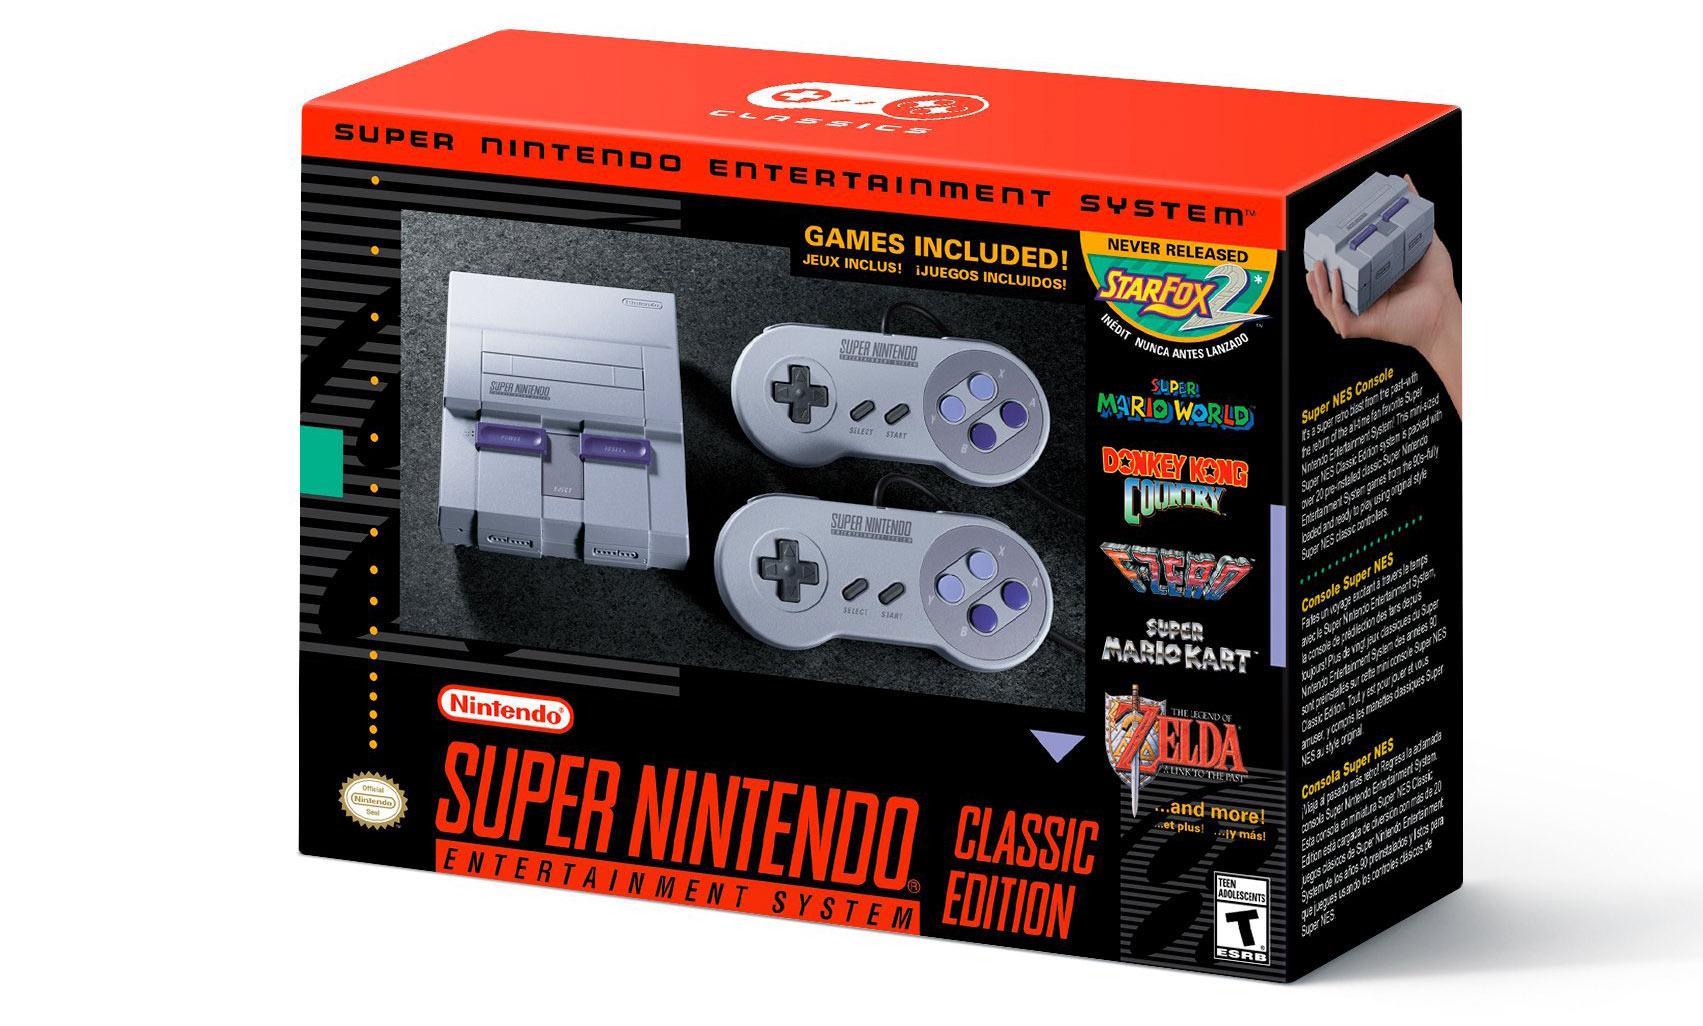 SNES Classic Box